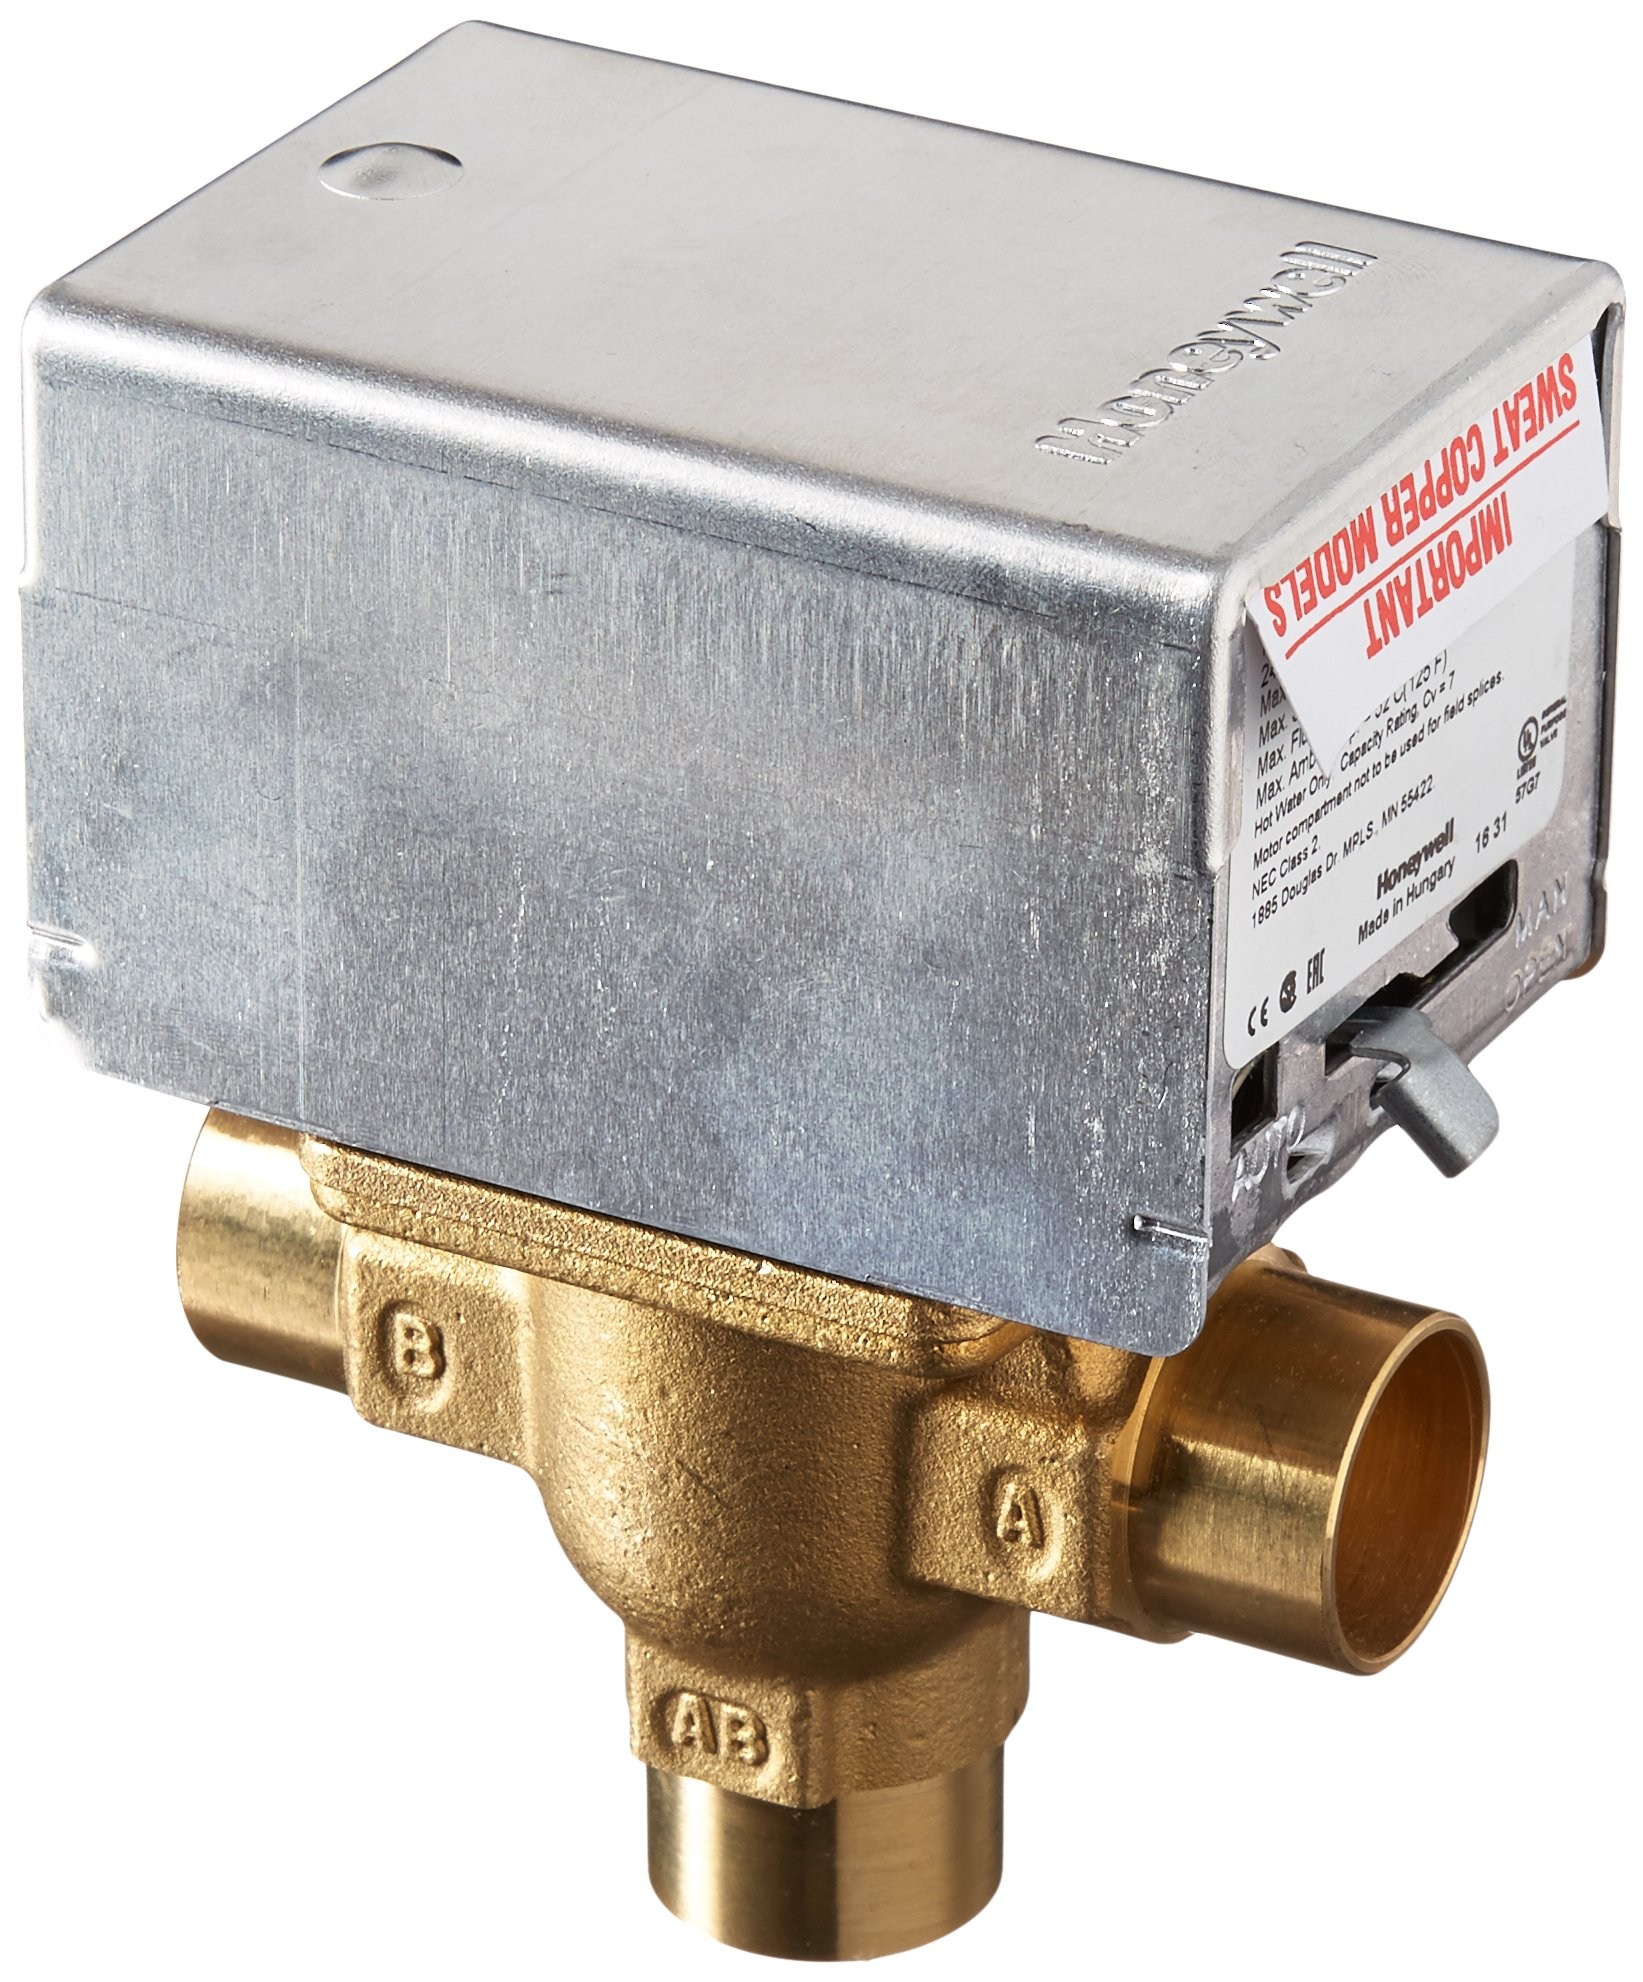 Honeywell V8044A1044 Electric Zone Valve